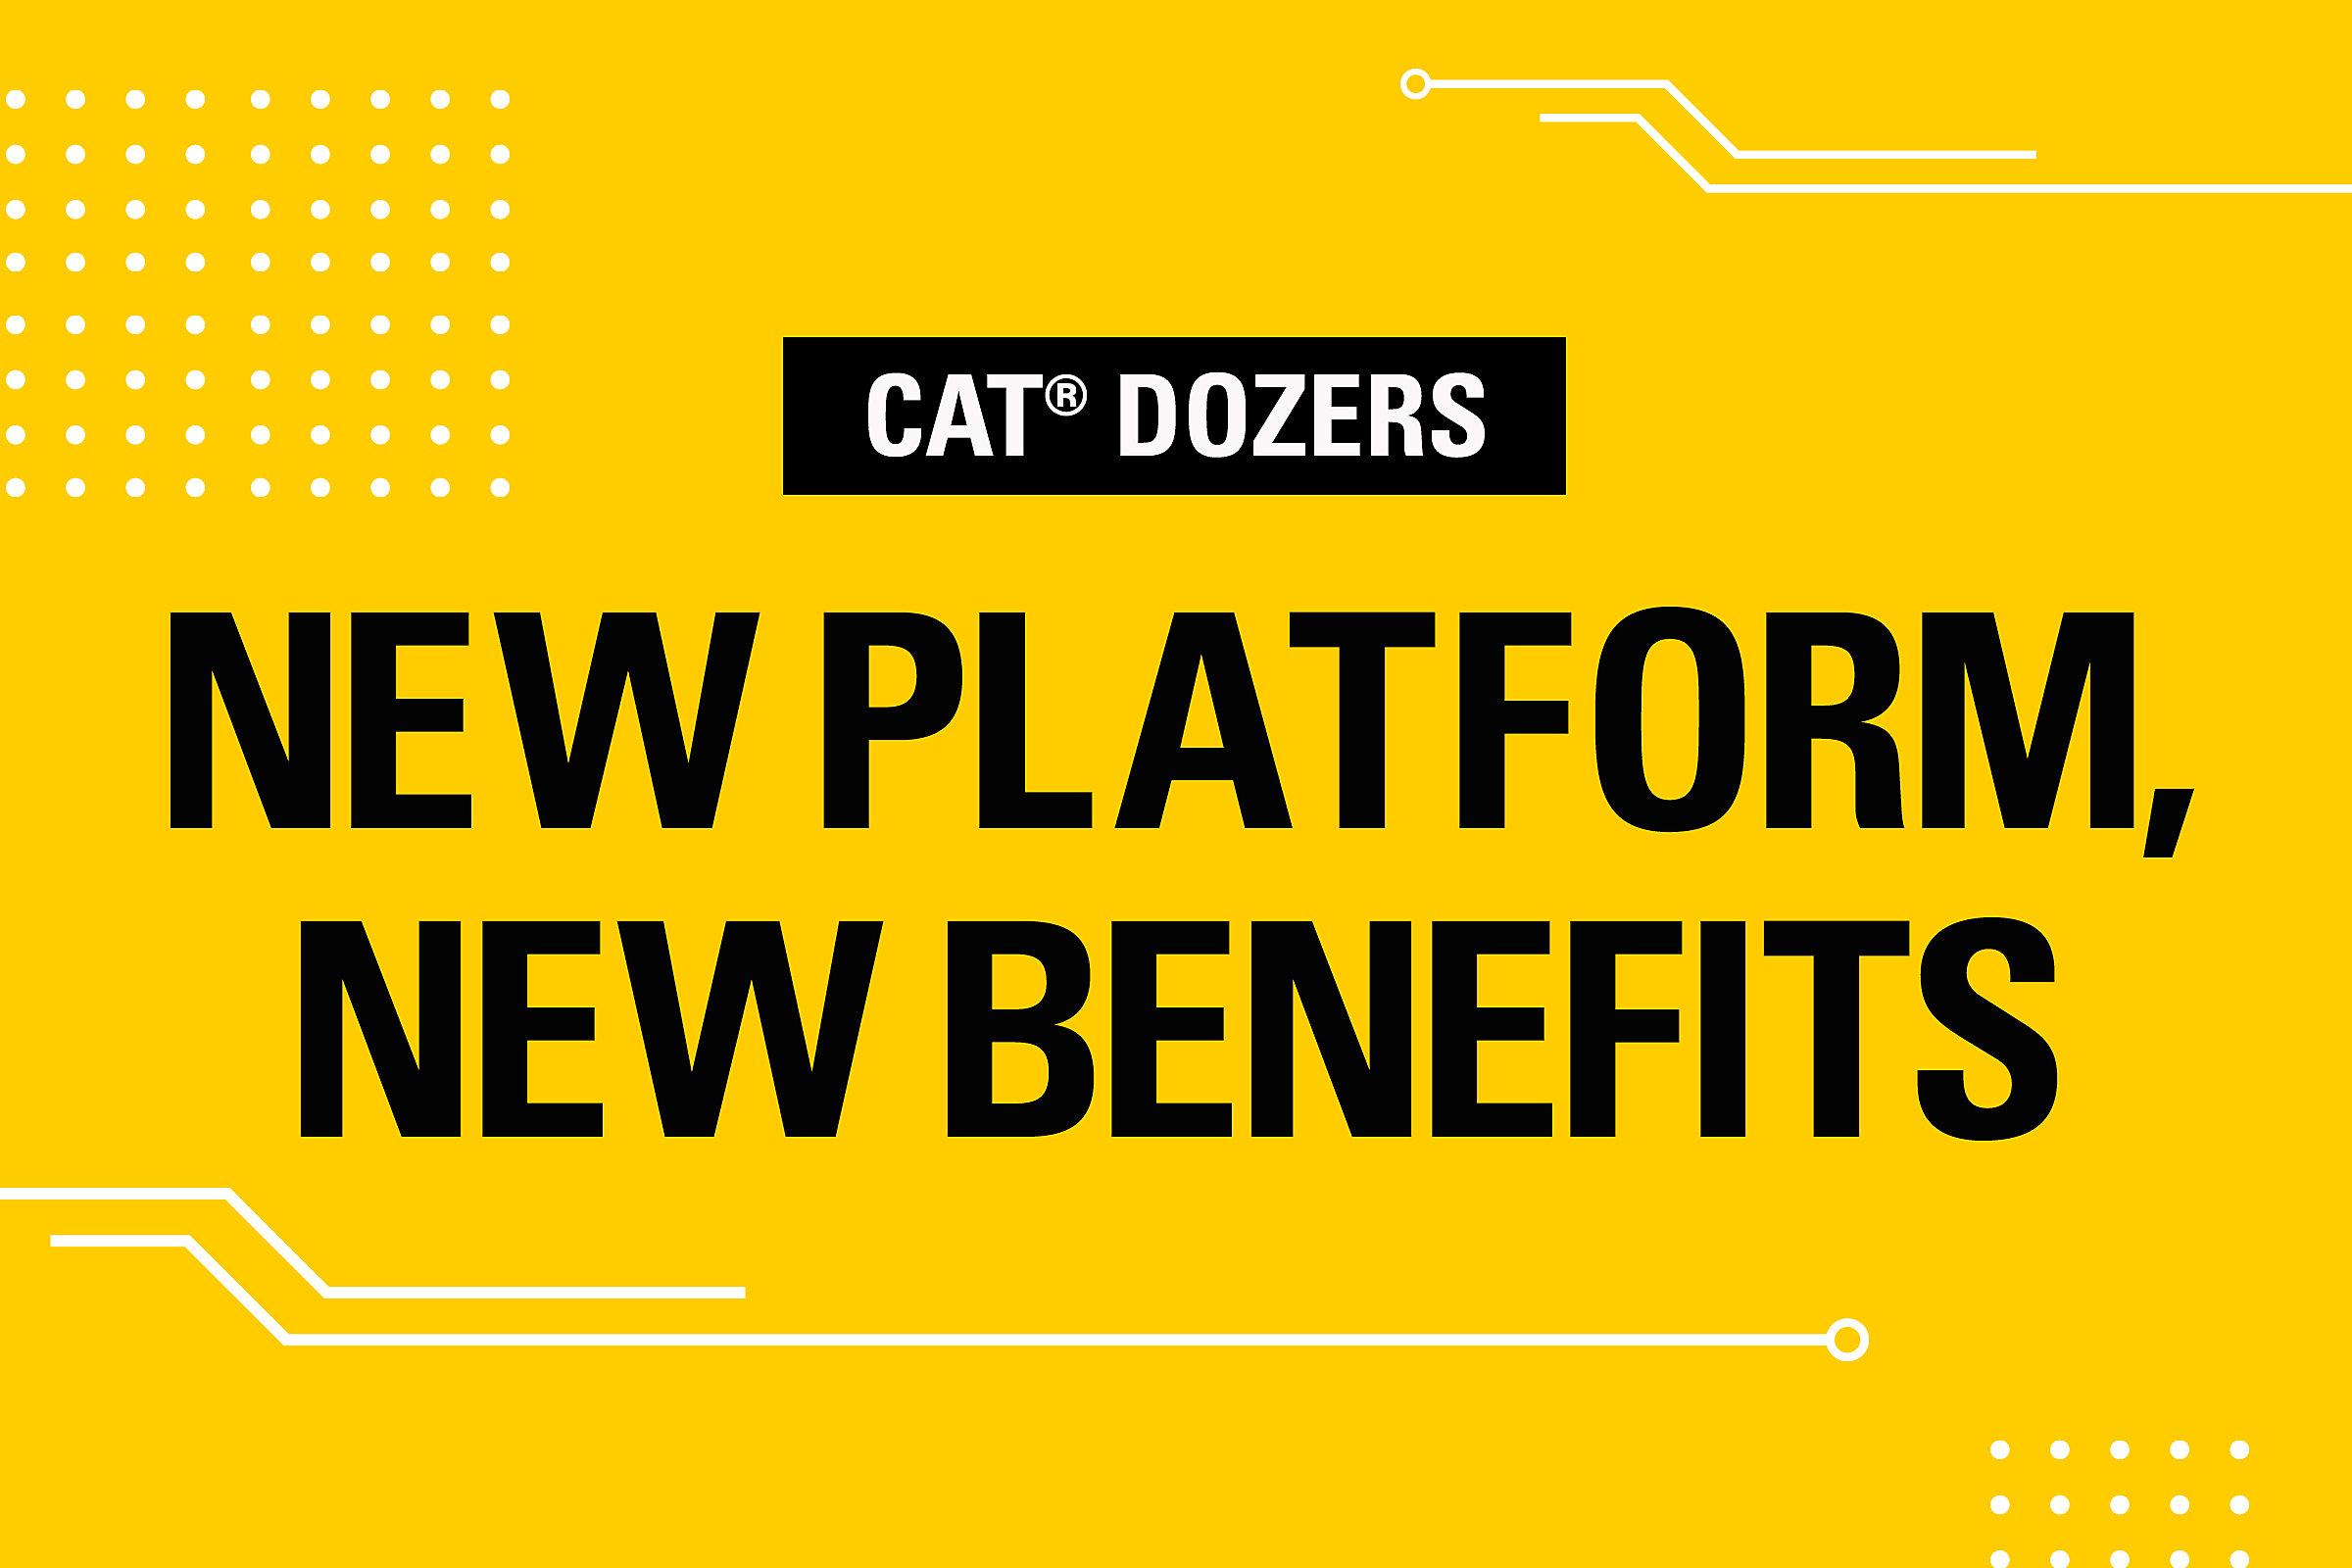 New Platform, New Benefits